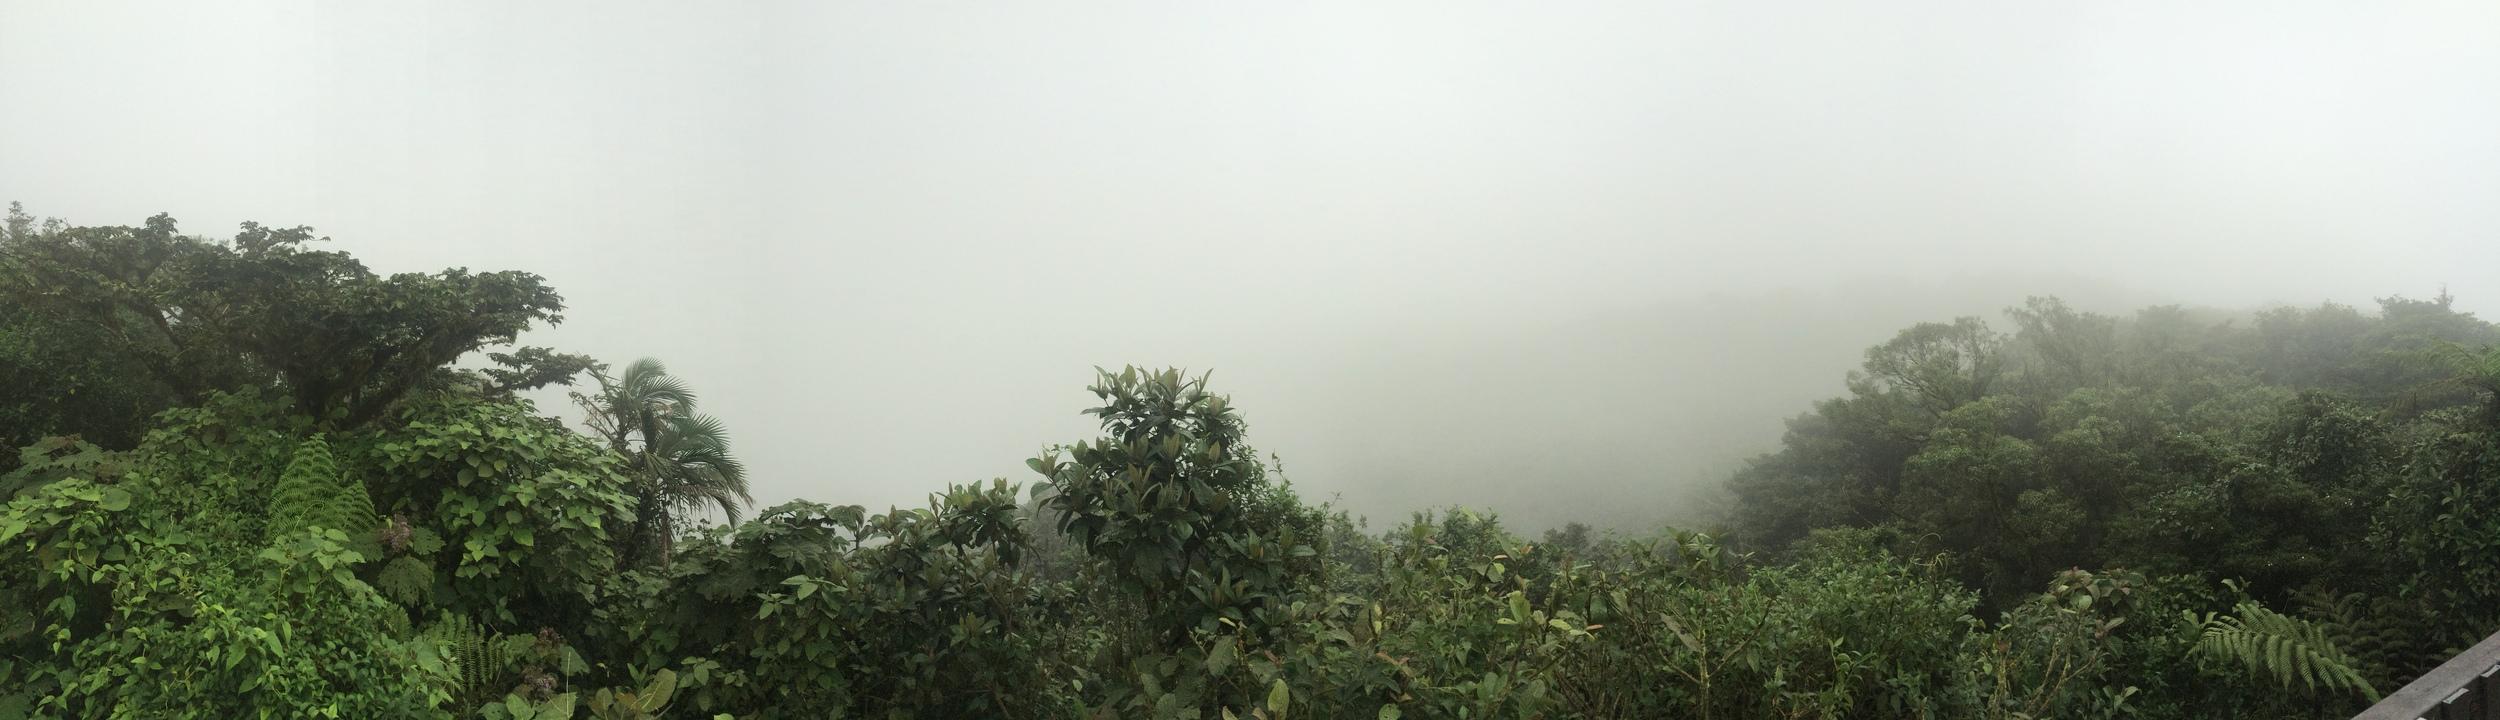 Monteverde Cloud Forest, August 2015